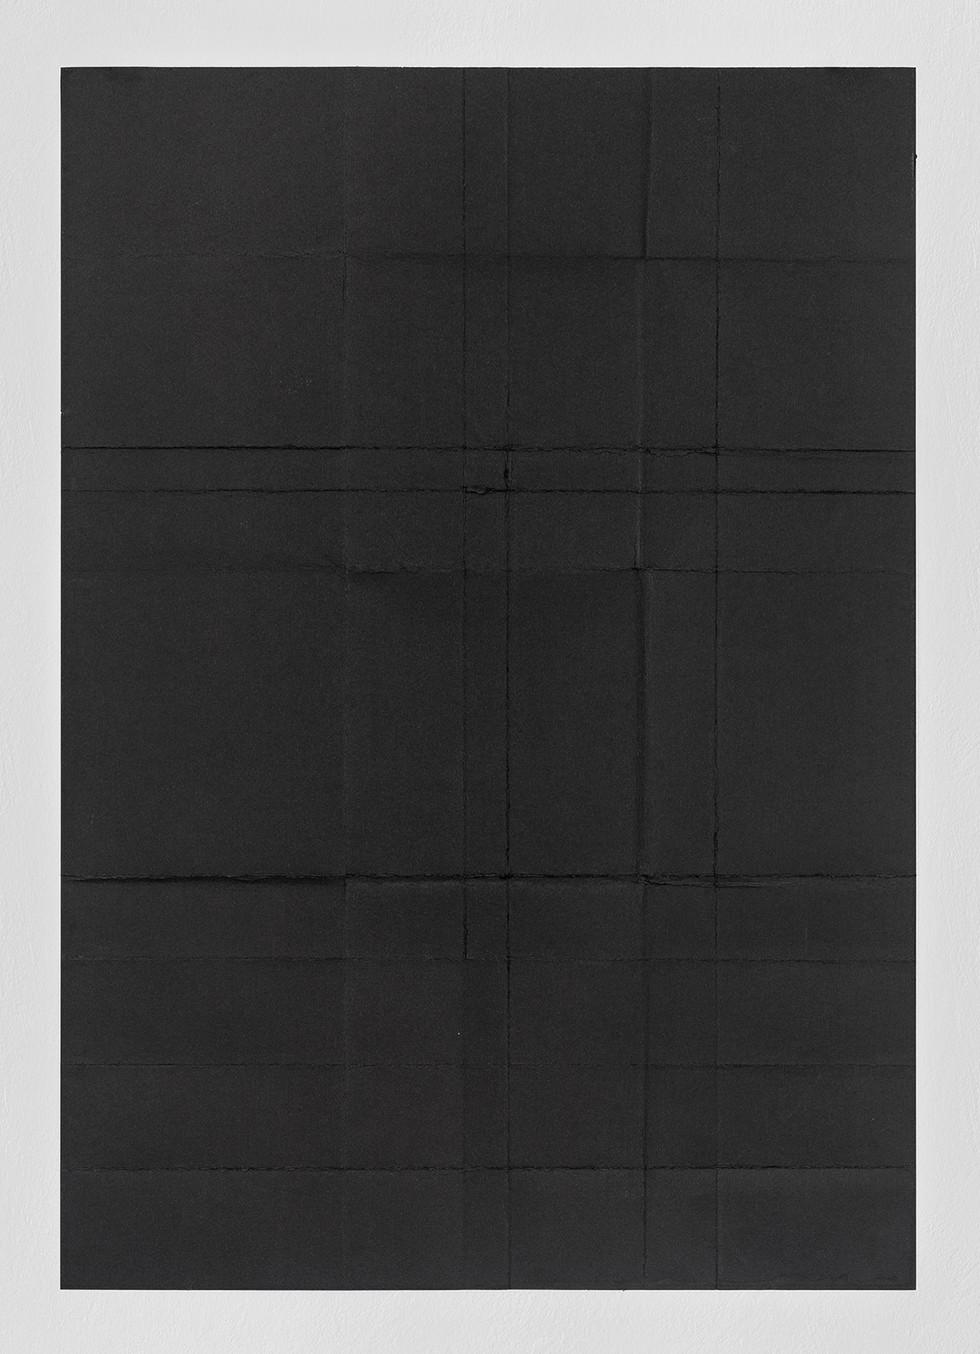 ST 2014 papel algodão dobrado 100x70cm.jpg